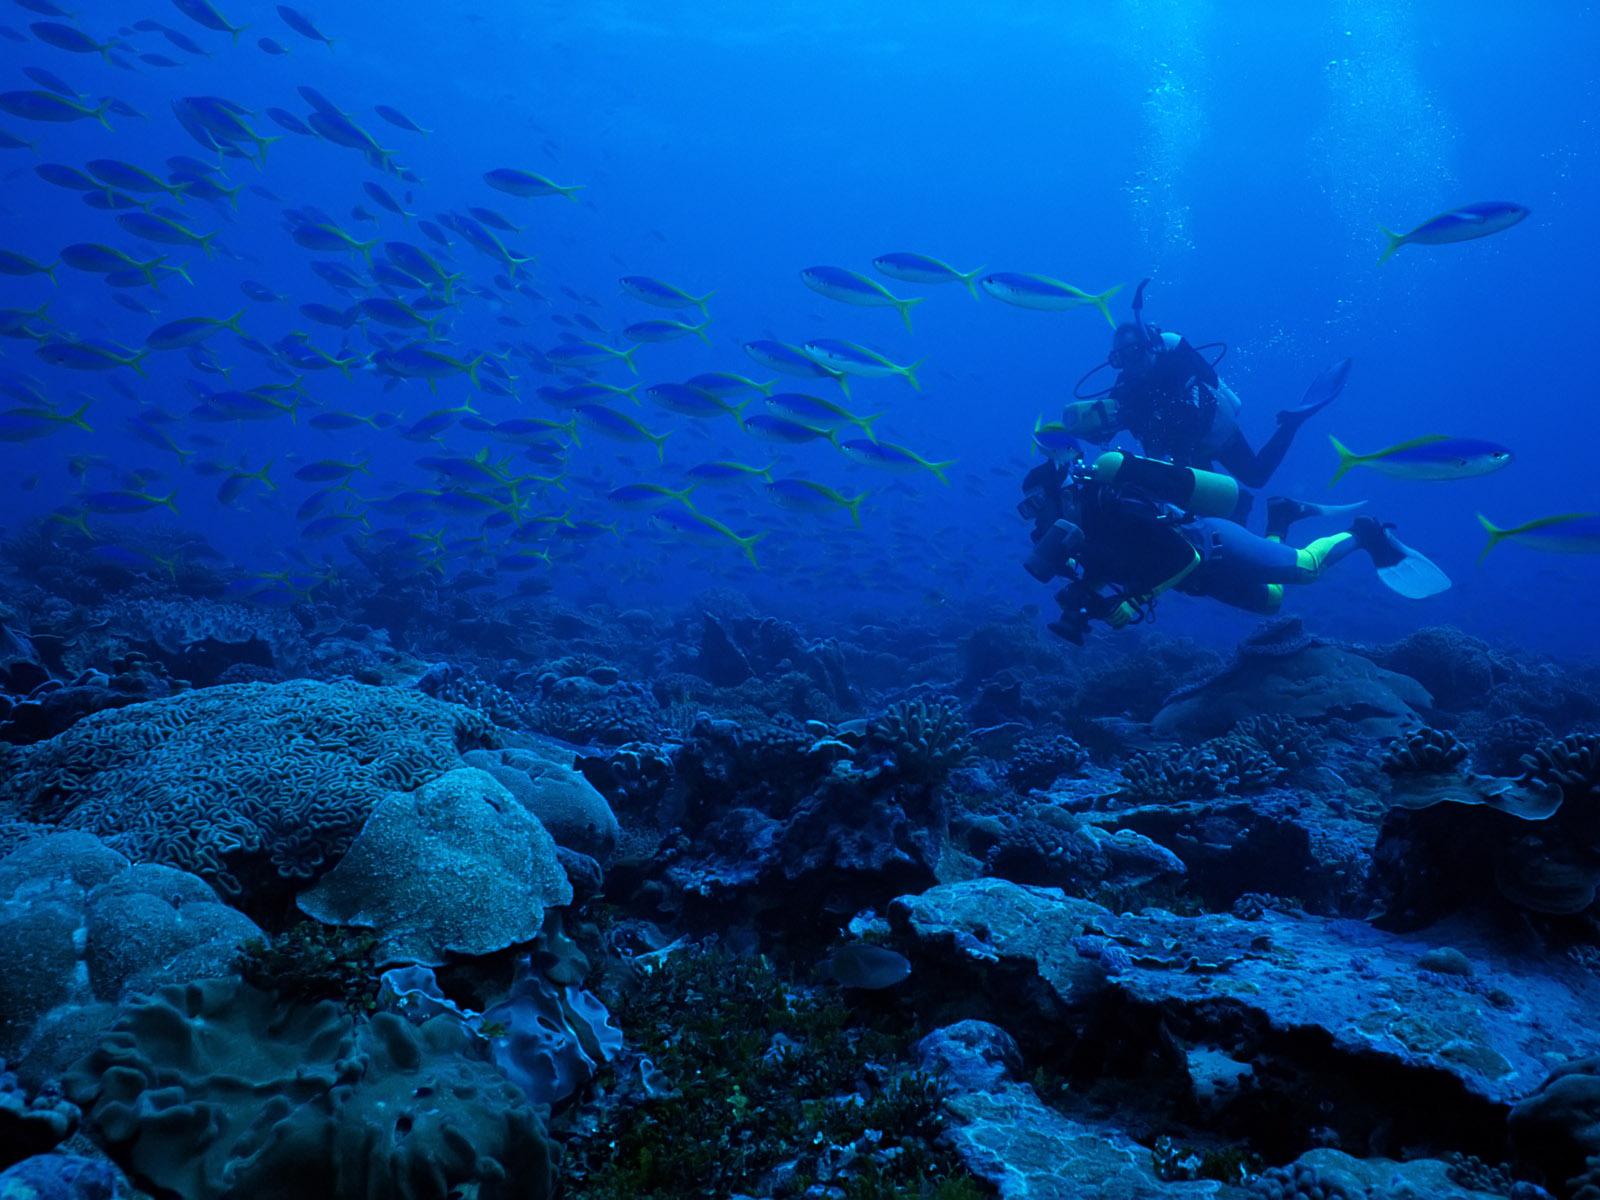 underwater cartoon wallpaper - photo #40